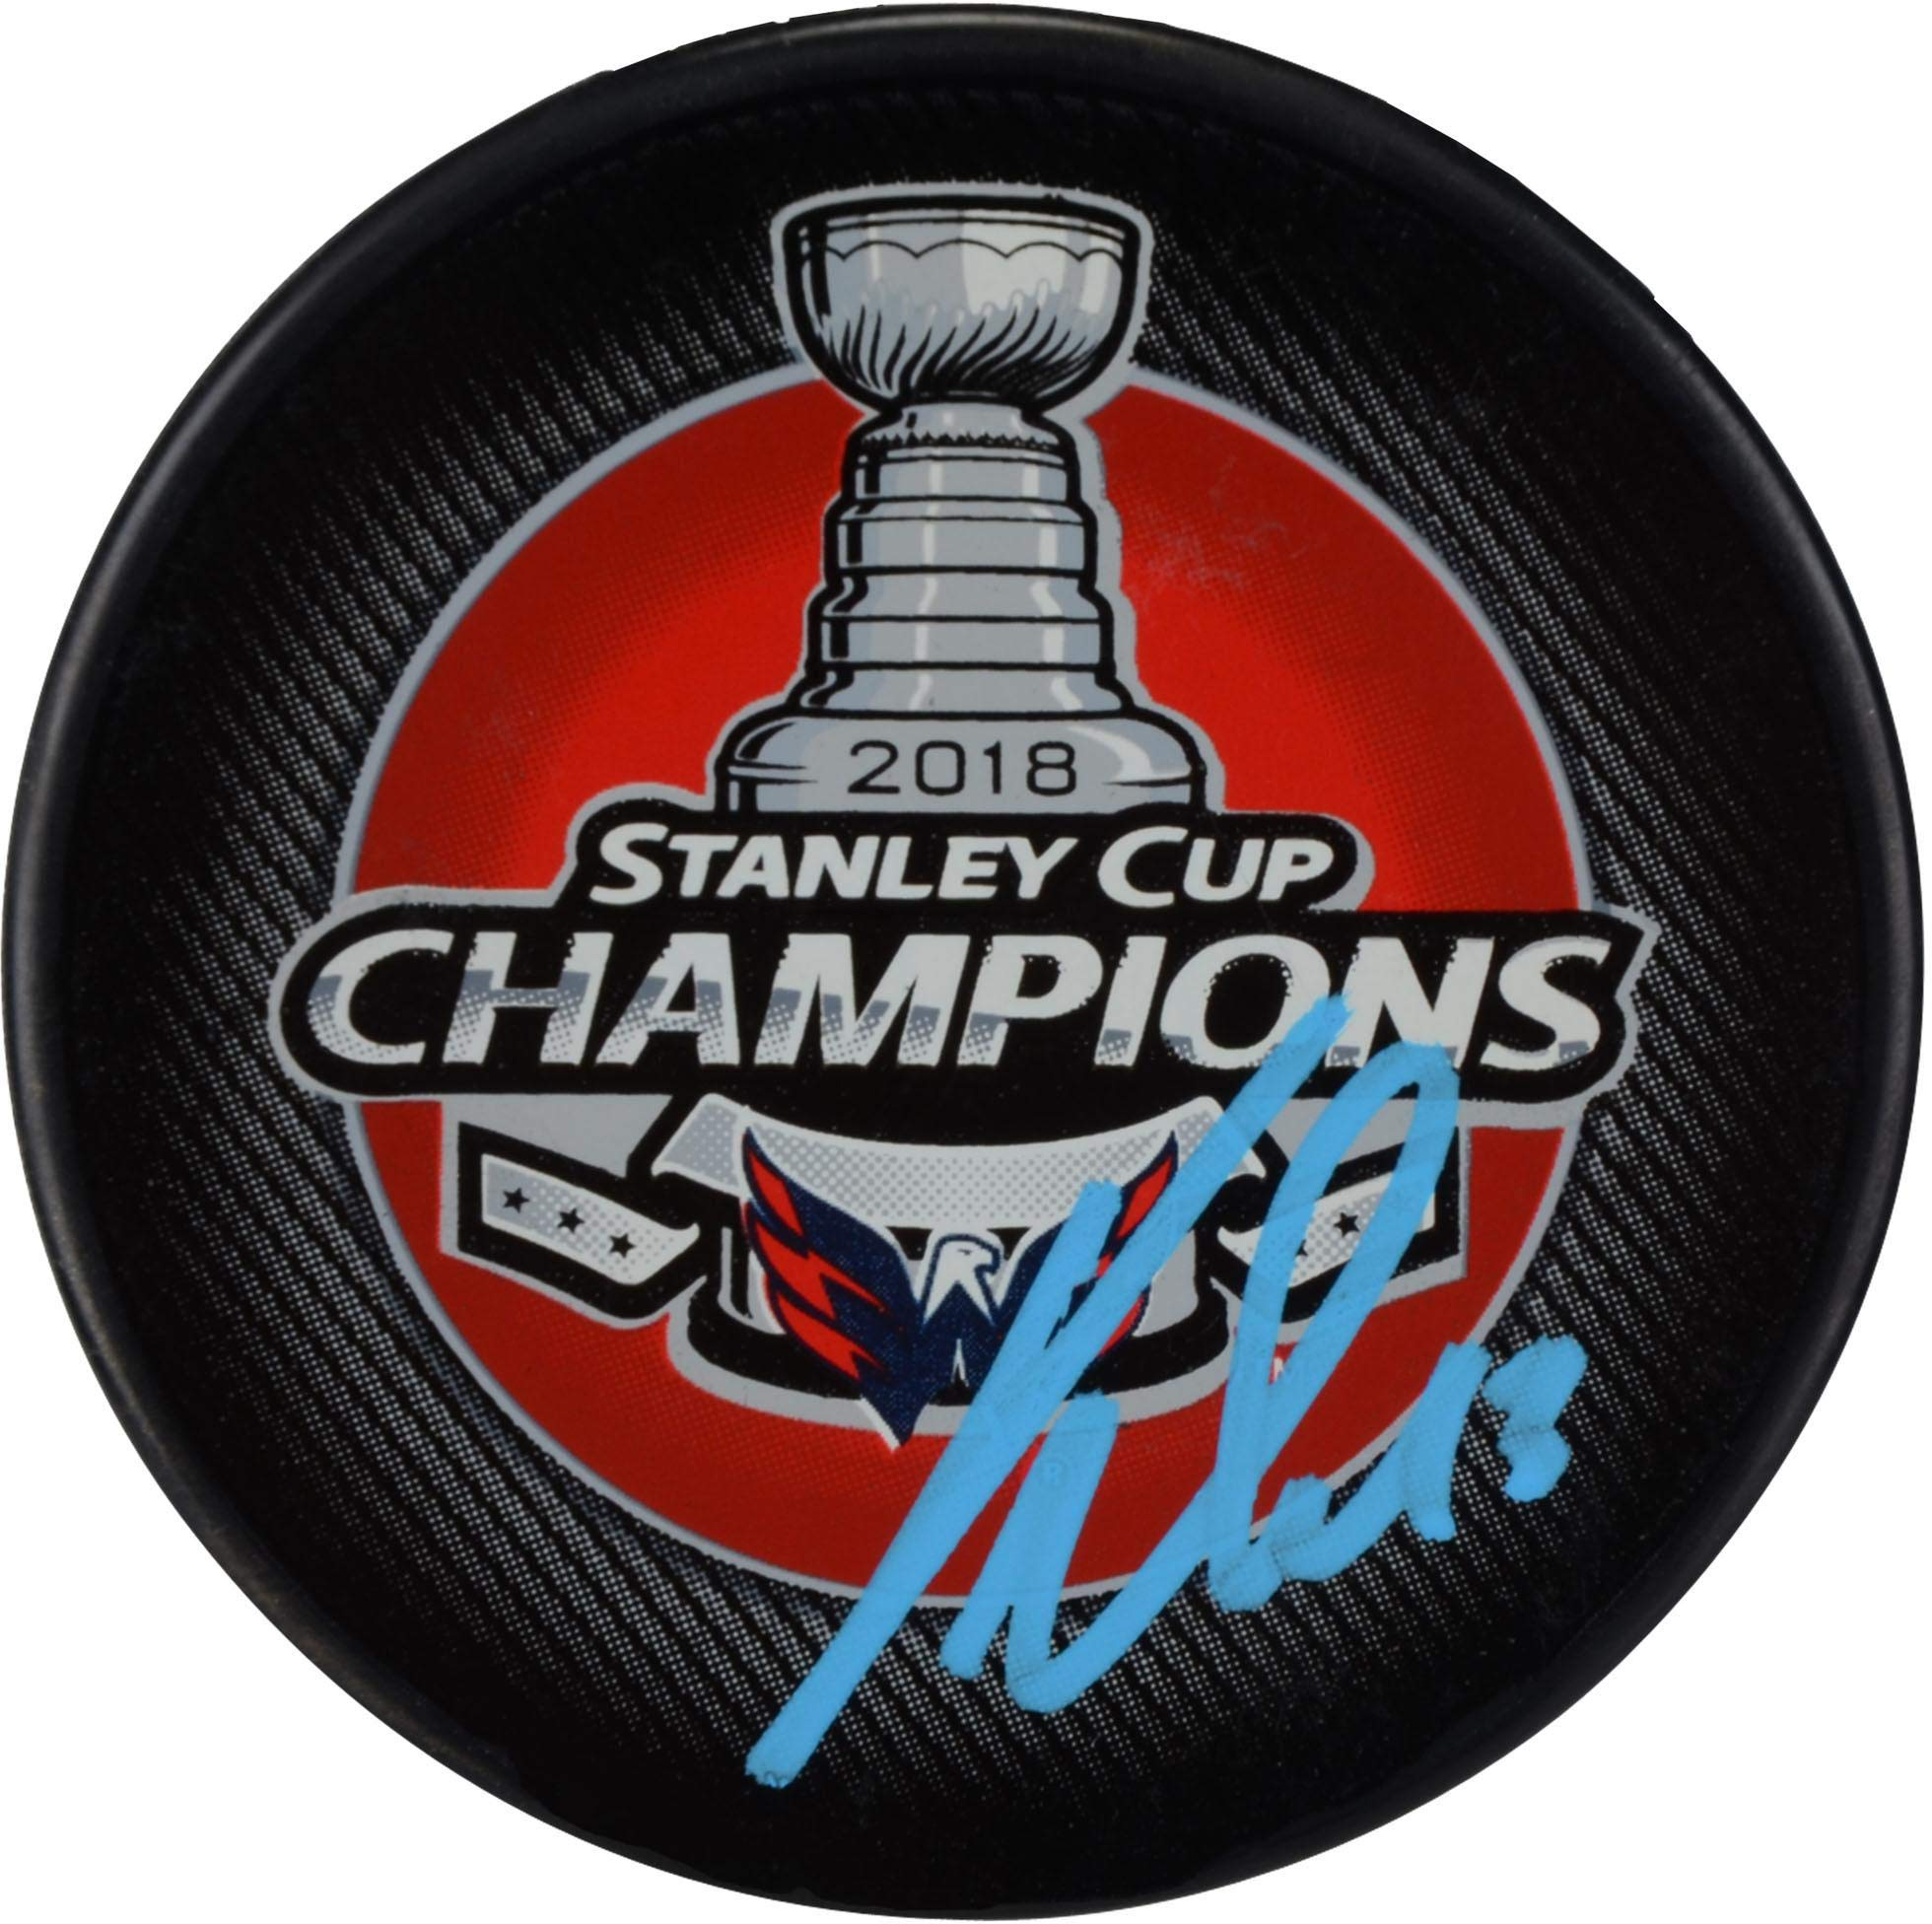 Jakub Vrana Washington Capitals 2018 Stanley Cup Champions Autographed Stanley Cup Champions Logo Hockey Puck Fanatics Authentic Certified